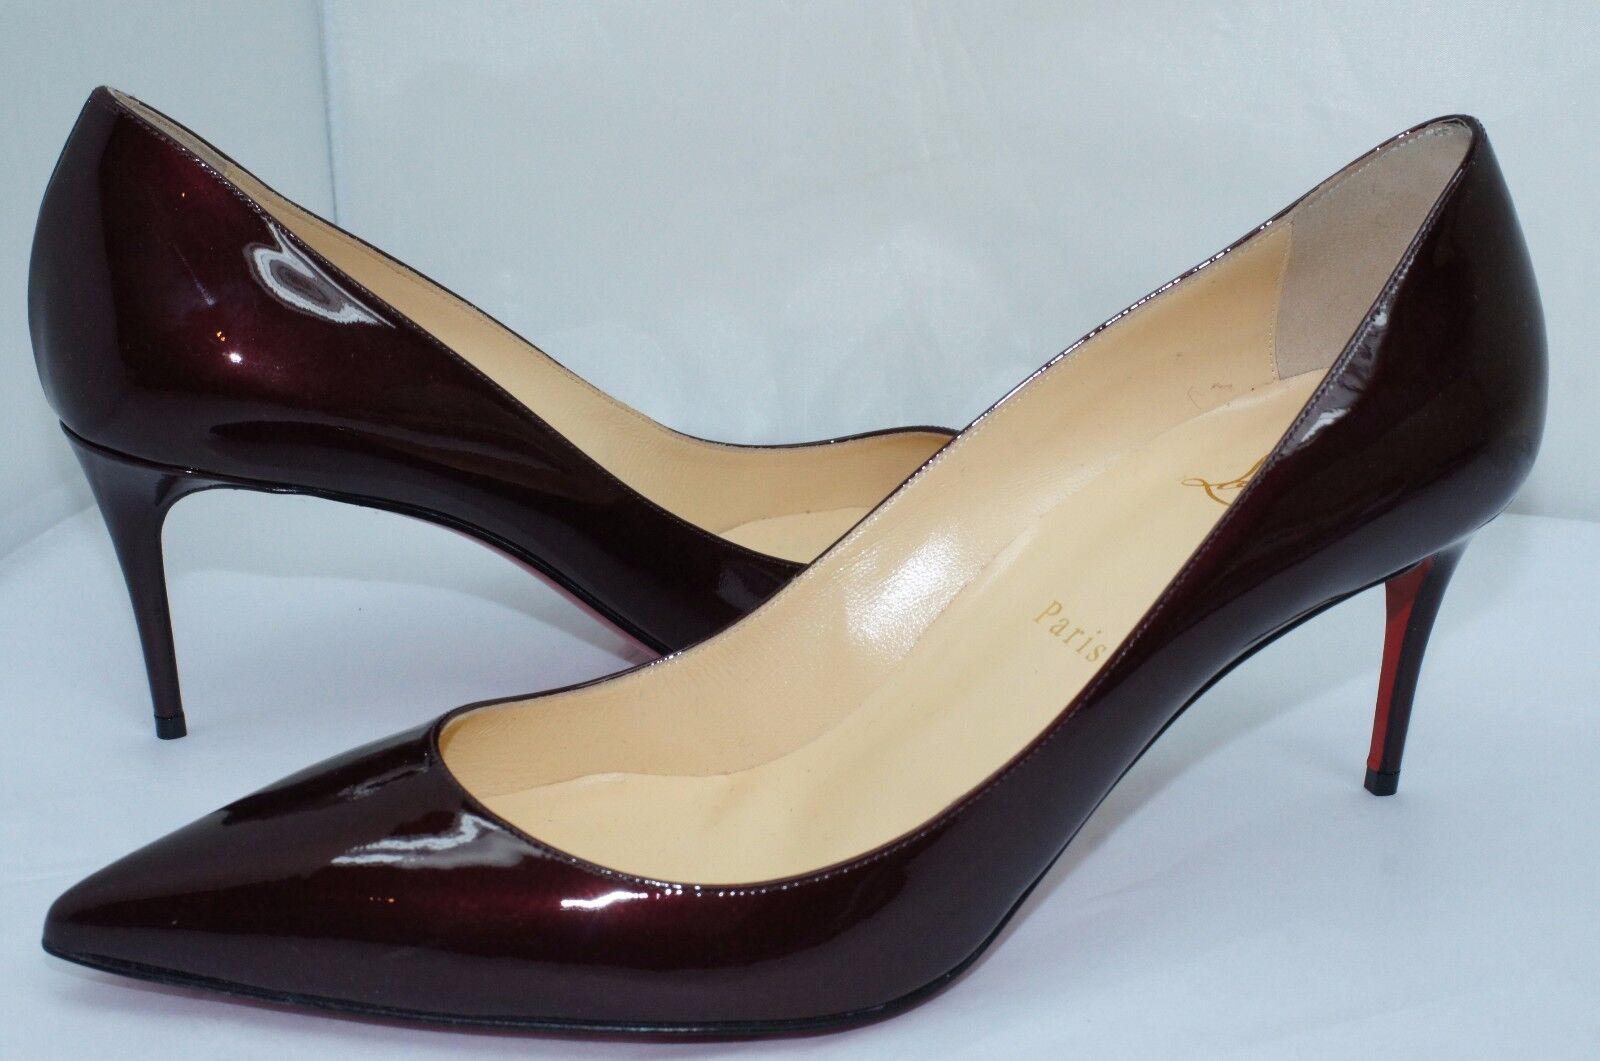 New Christian Louboutin Decollete 544 Pumps Womens Shoes Size 40.5 Heels